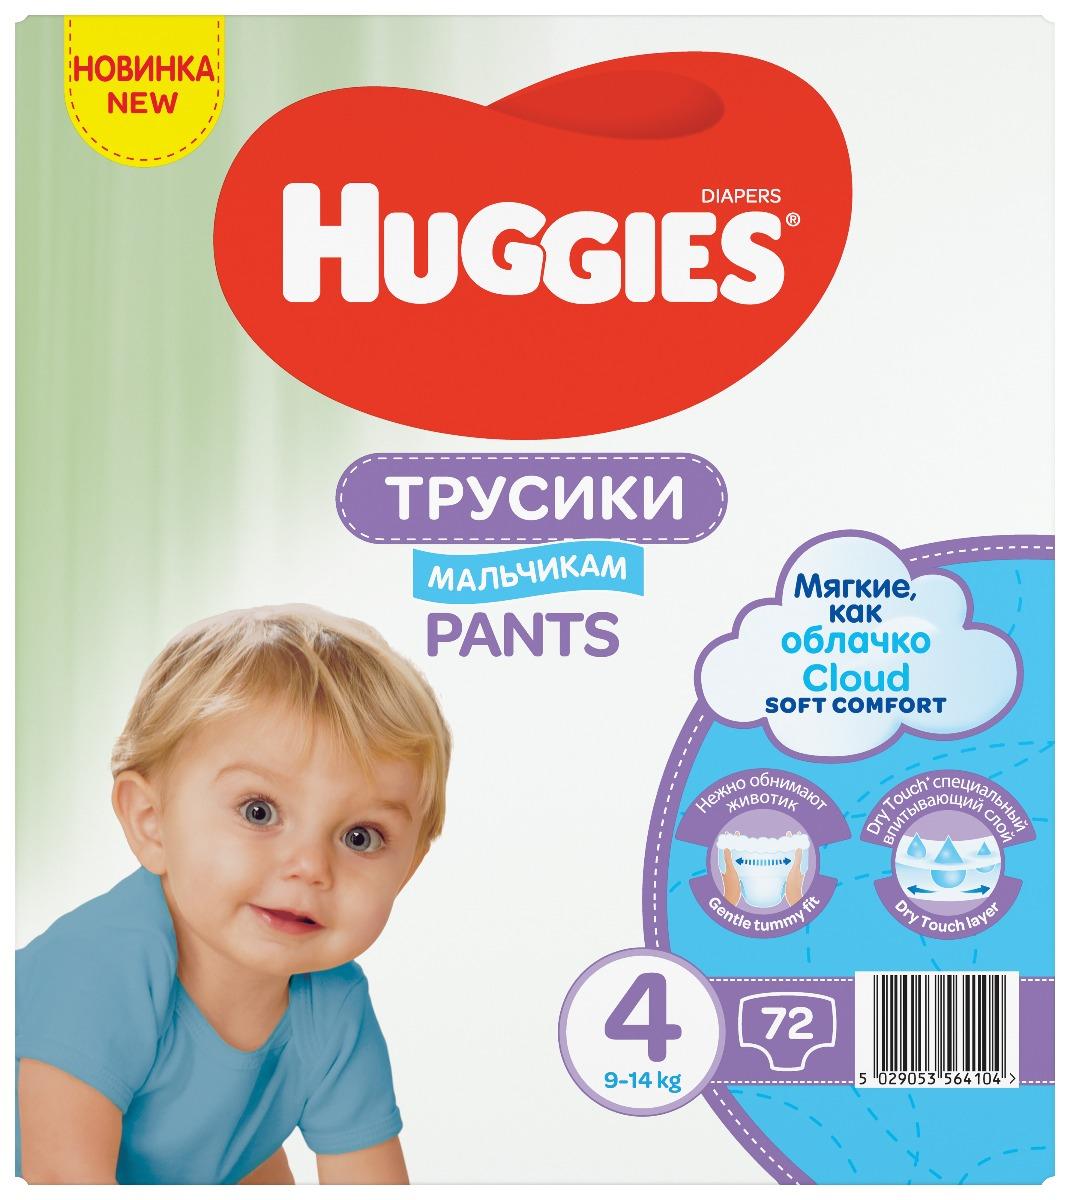 Scutece Huggies Pants Box Boys, Nr 4, 9 - 14 Kg, 72 Buc